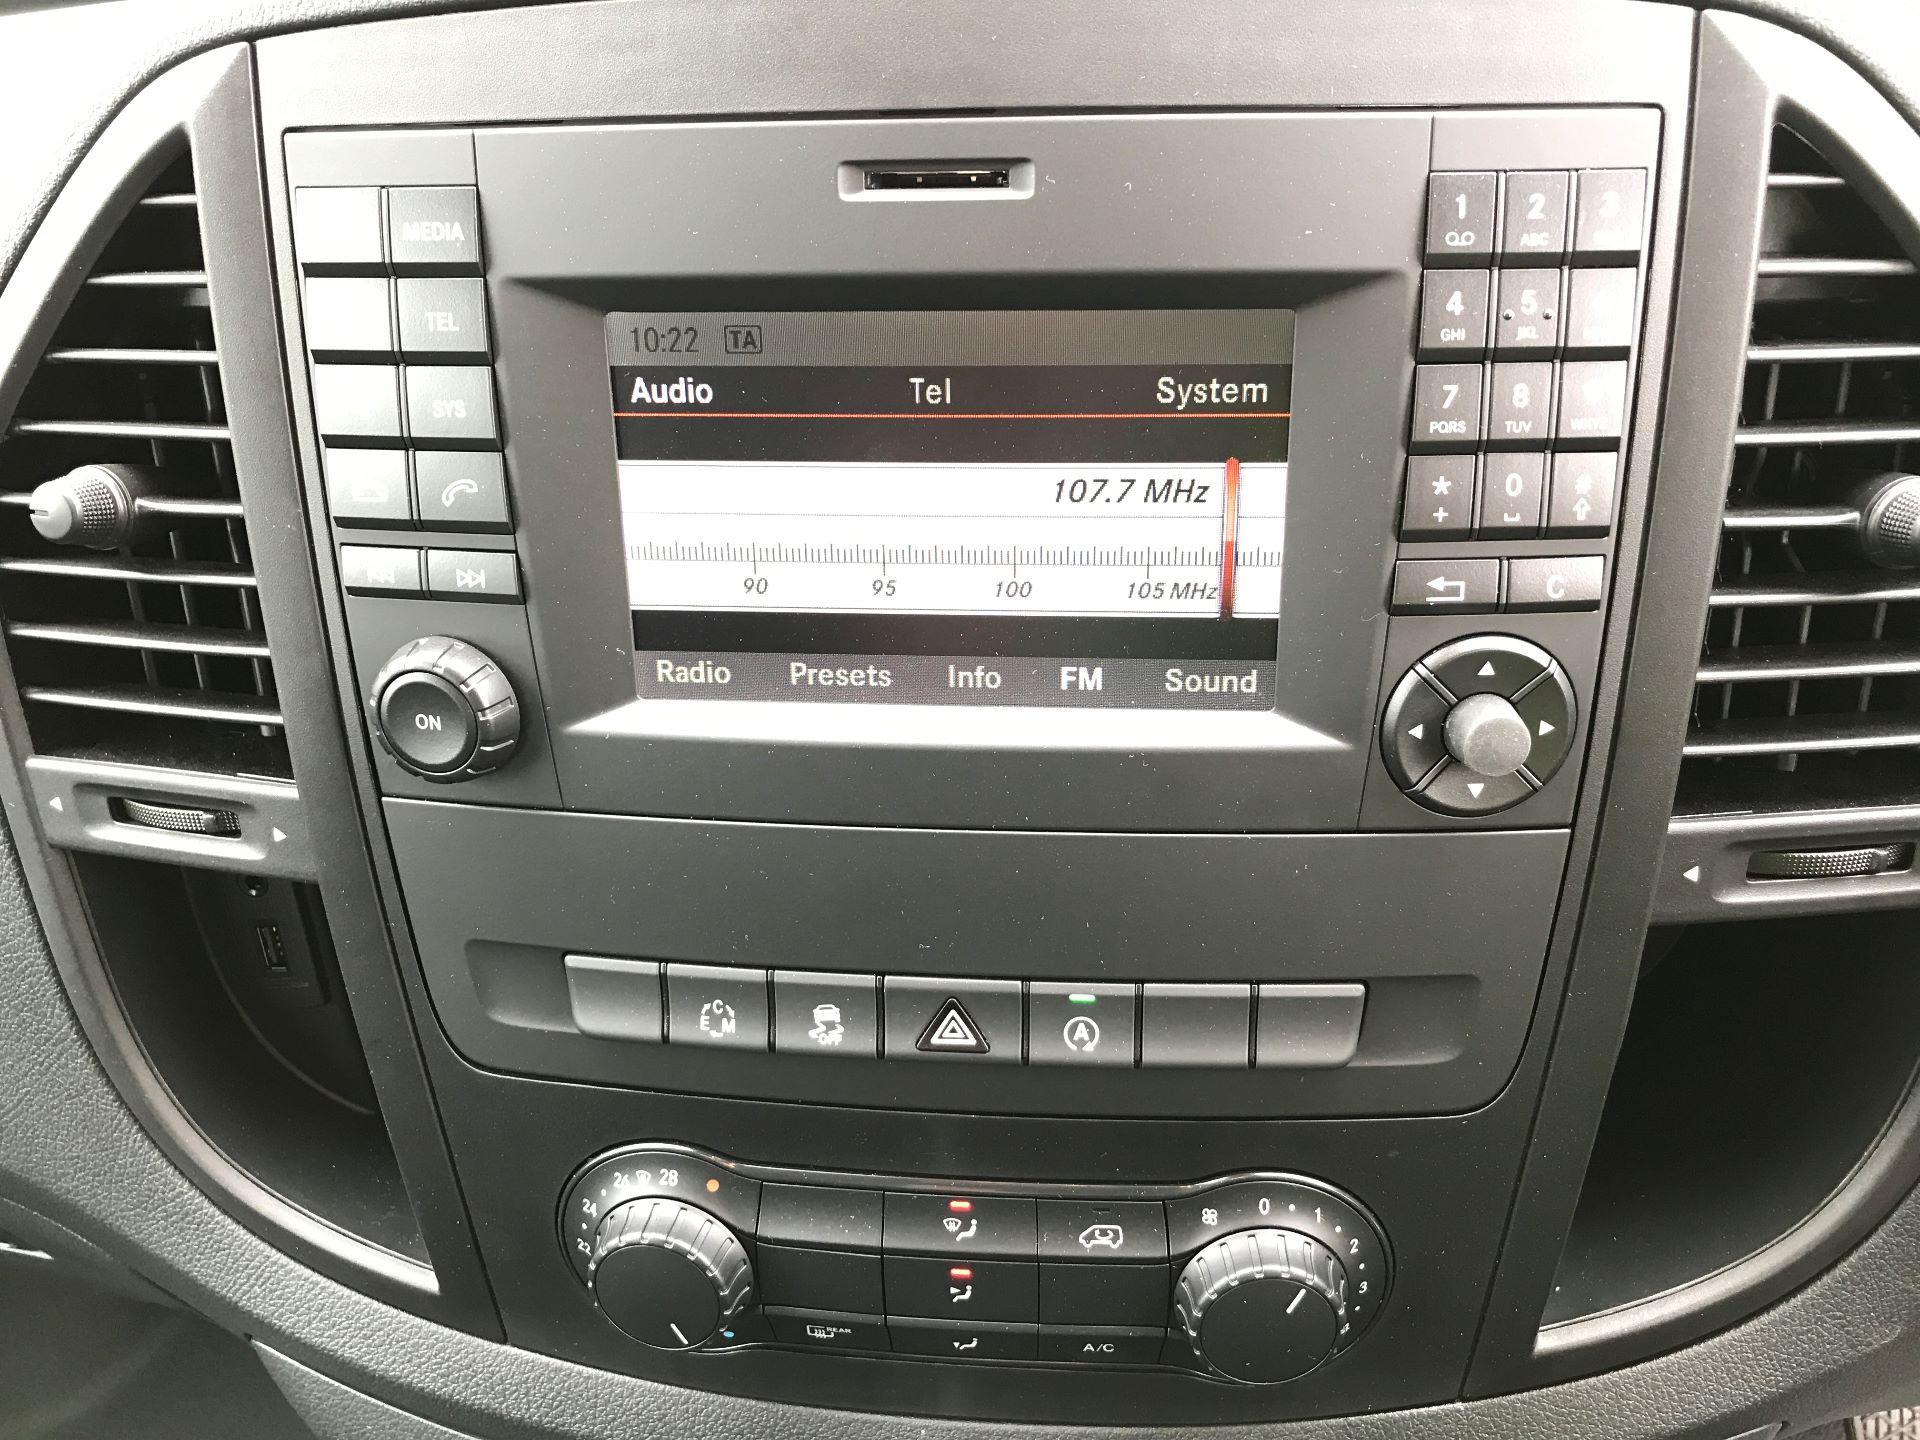 2018 Mercedes-Benz Vito 119CDI COMPACT BLUETECH 190PS DUALINER SPORT AUTOMATIC EURO 6 (YS18KAJ) Image 3